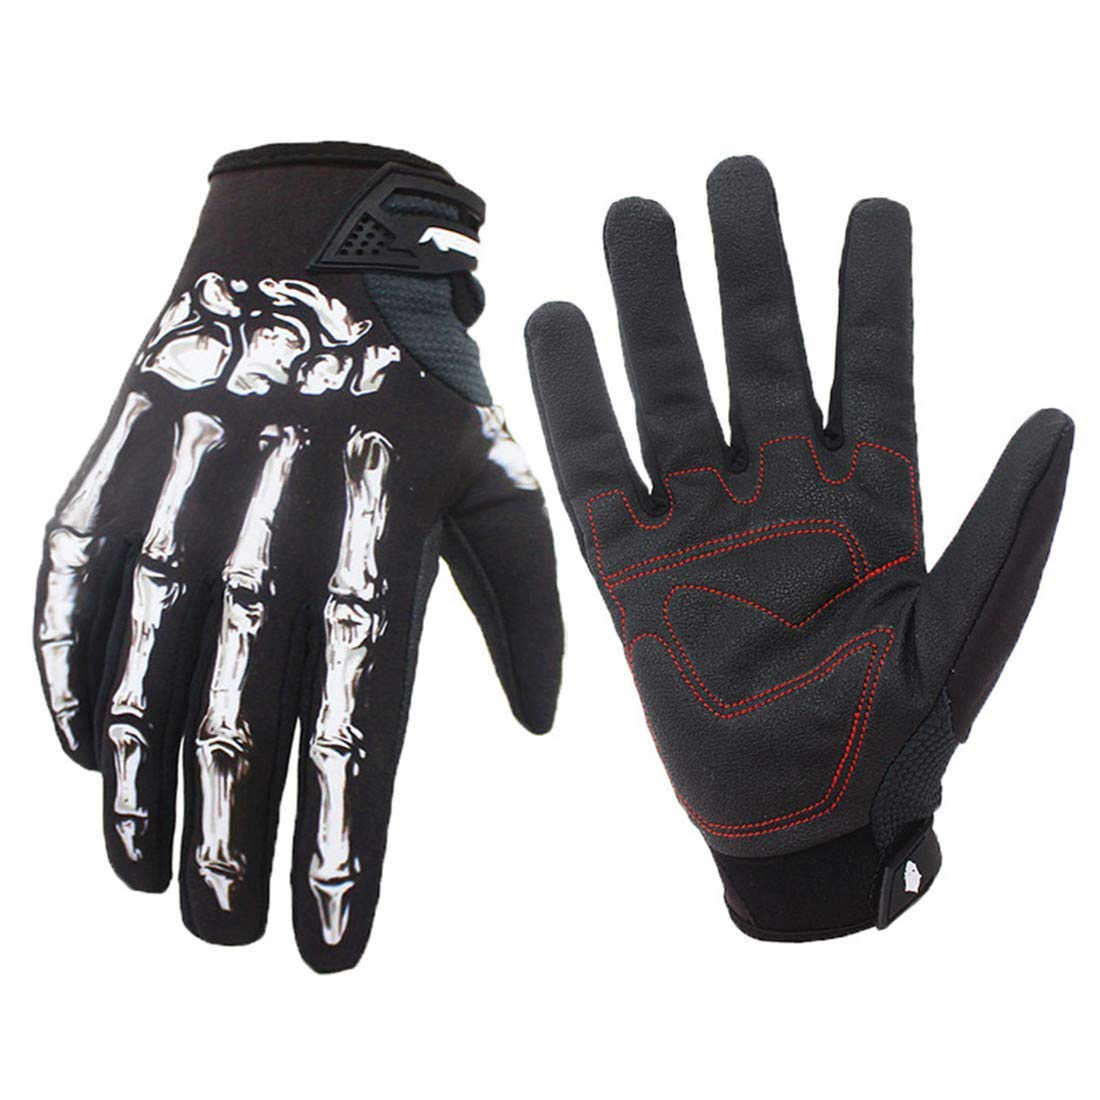 Winter&Autumn Skeleton Bones Gloves Windproof Waterproof Touch-Screen Sports Glove Bikes Motorcycle